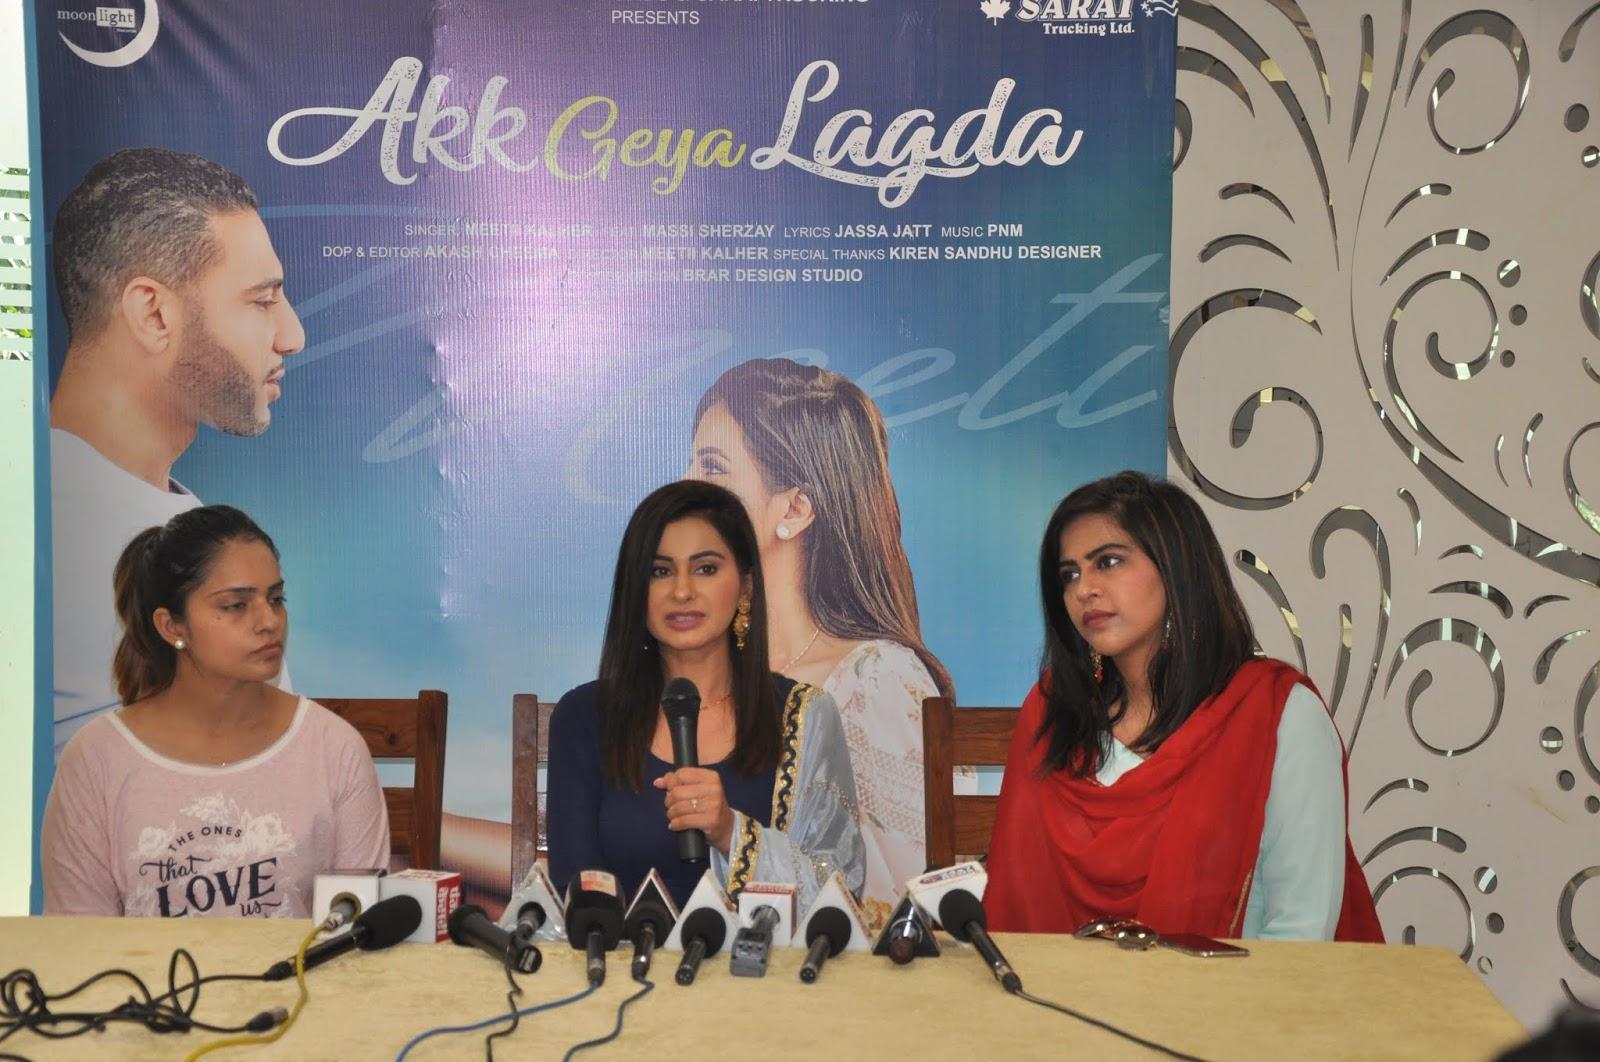 Samachar Vishesh Canada Based Celebrity Make Up Artiste Turned Singer Meetii Kalher Unveils Single Akk Geya Lagda